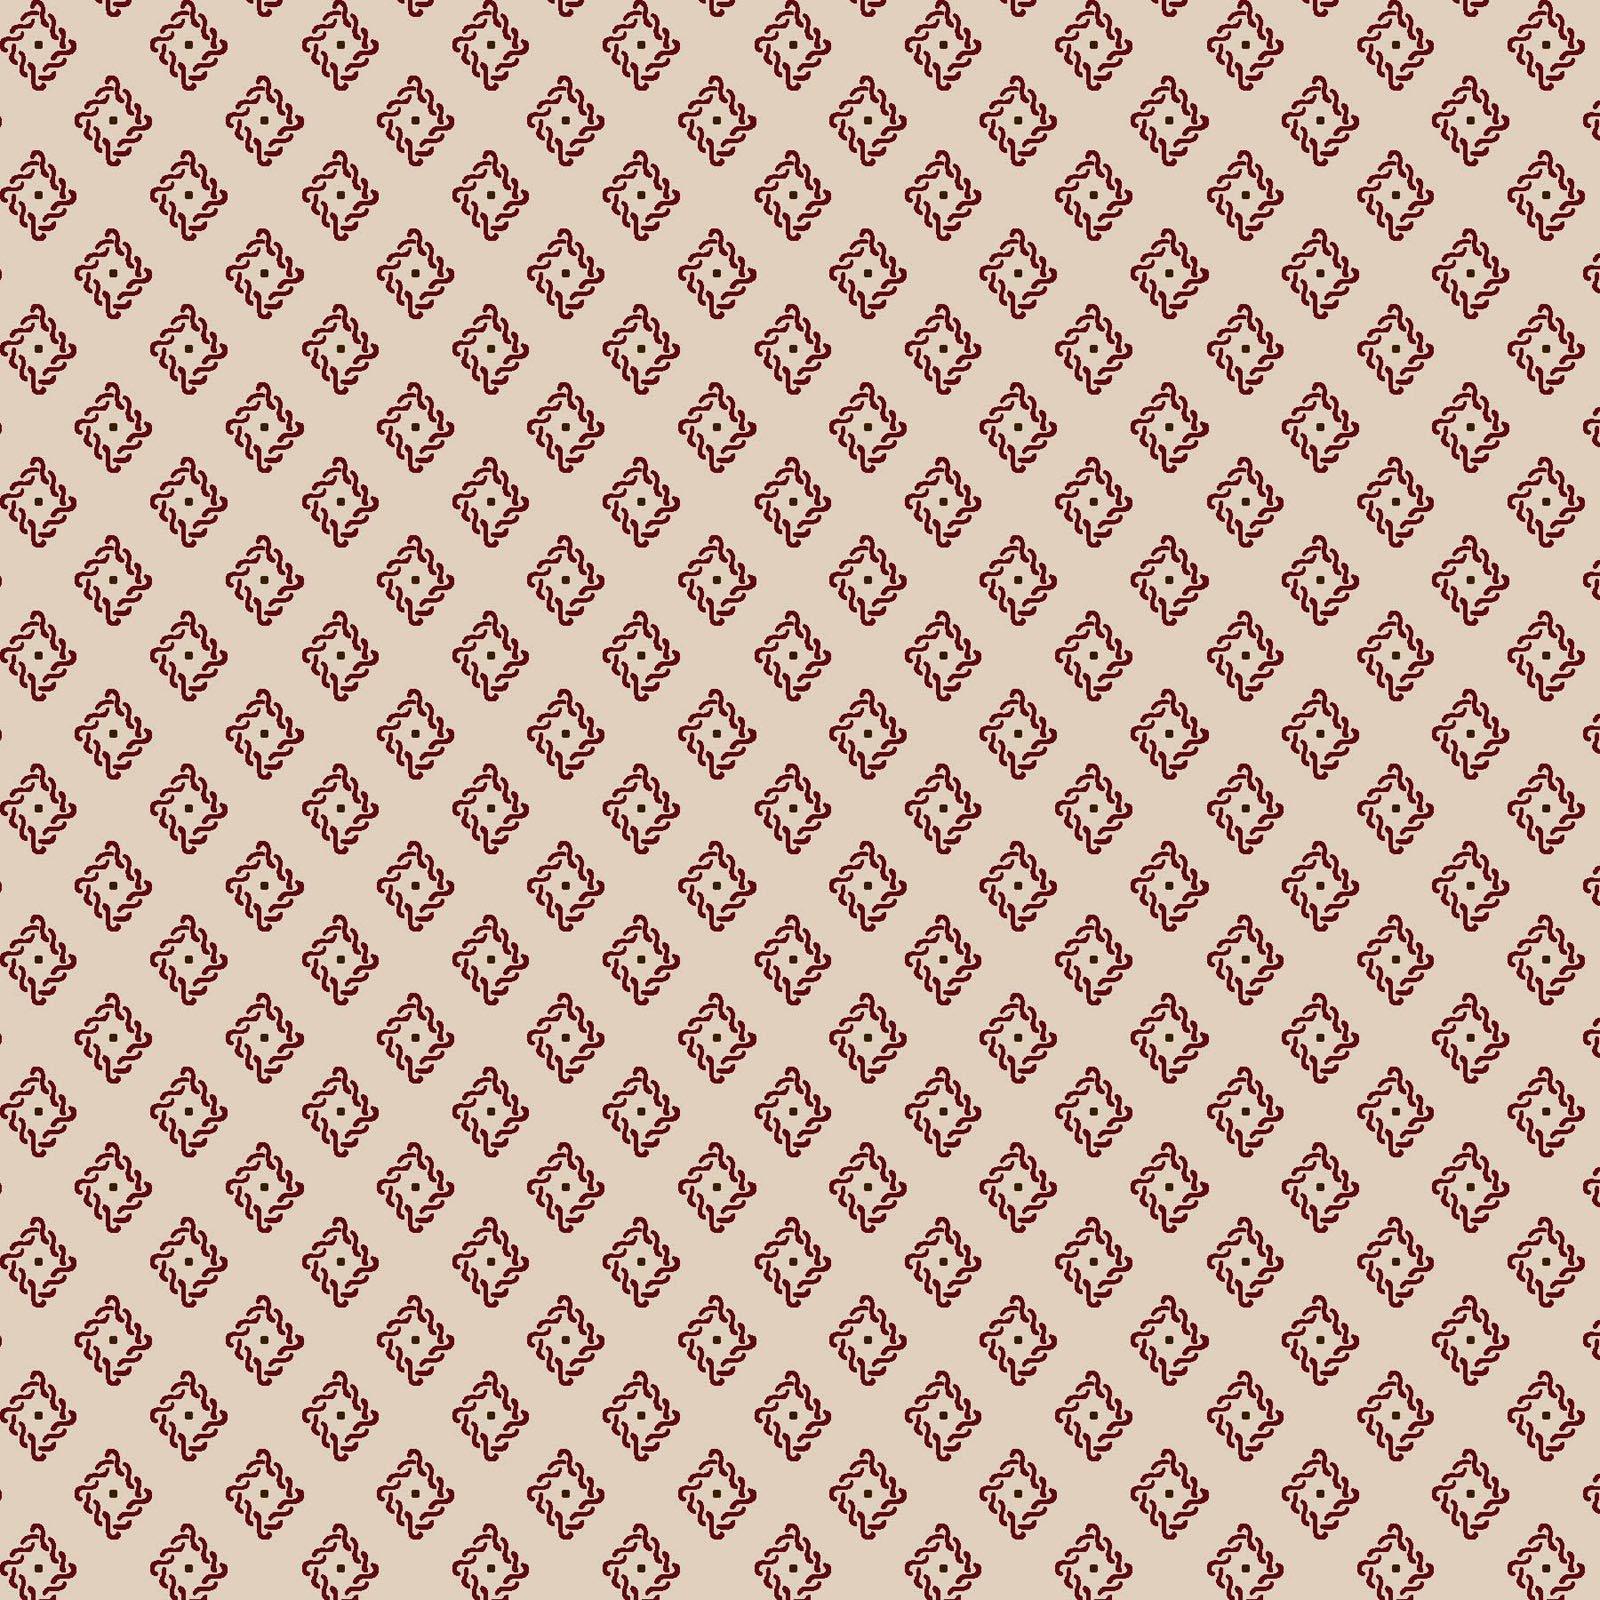 Ruby - Foulard - Tan /Red